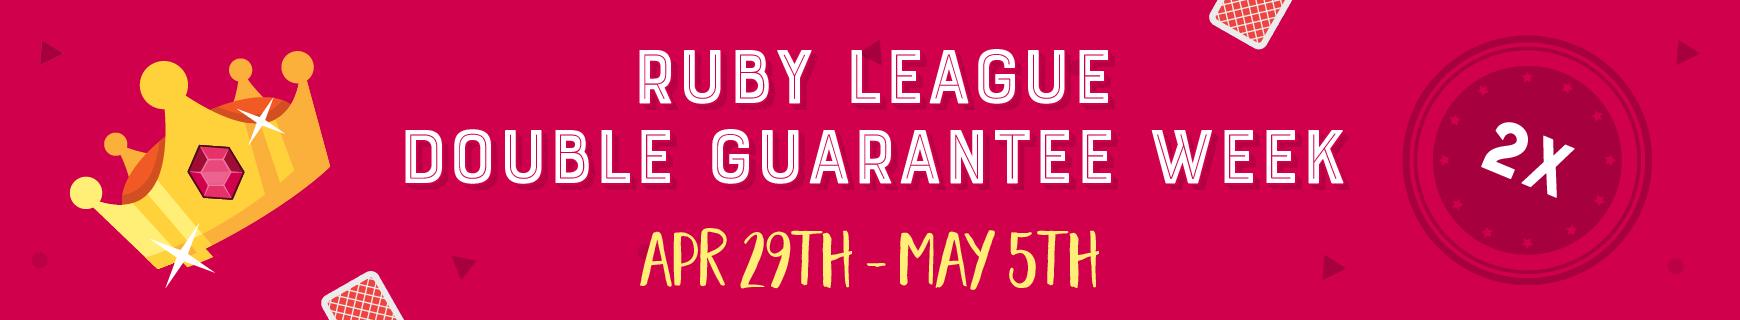 Gemstone double guarantee week   ruby %28870 x 160%29 2x